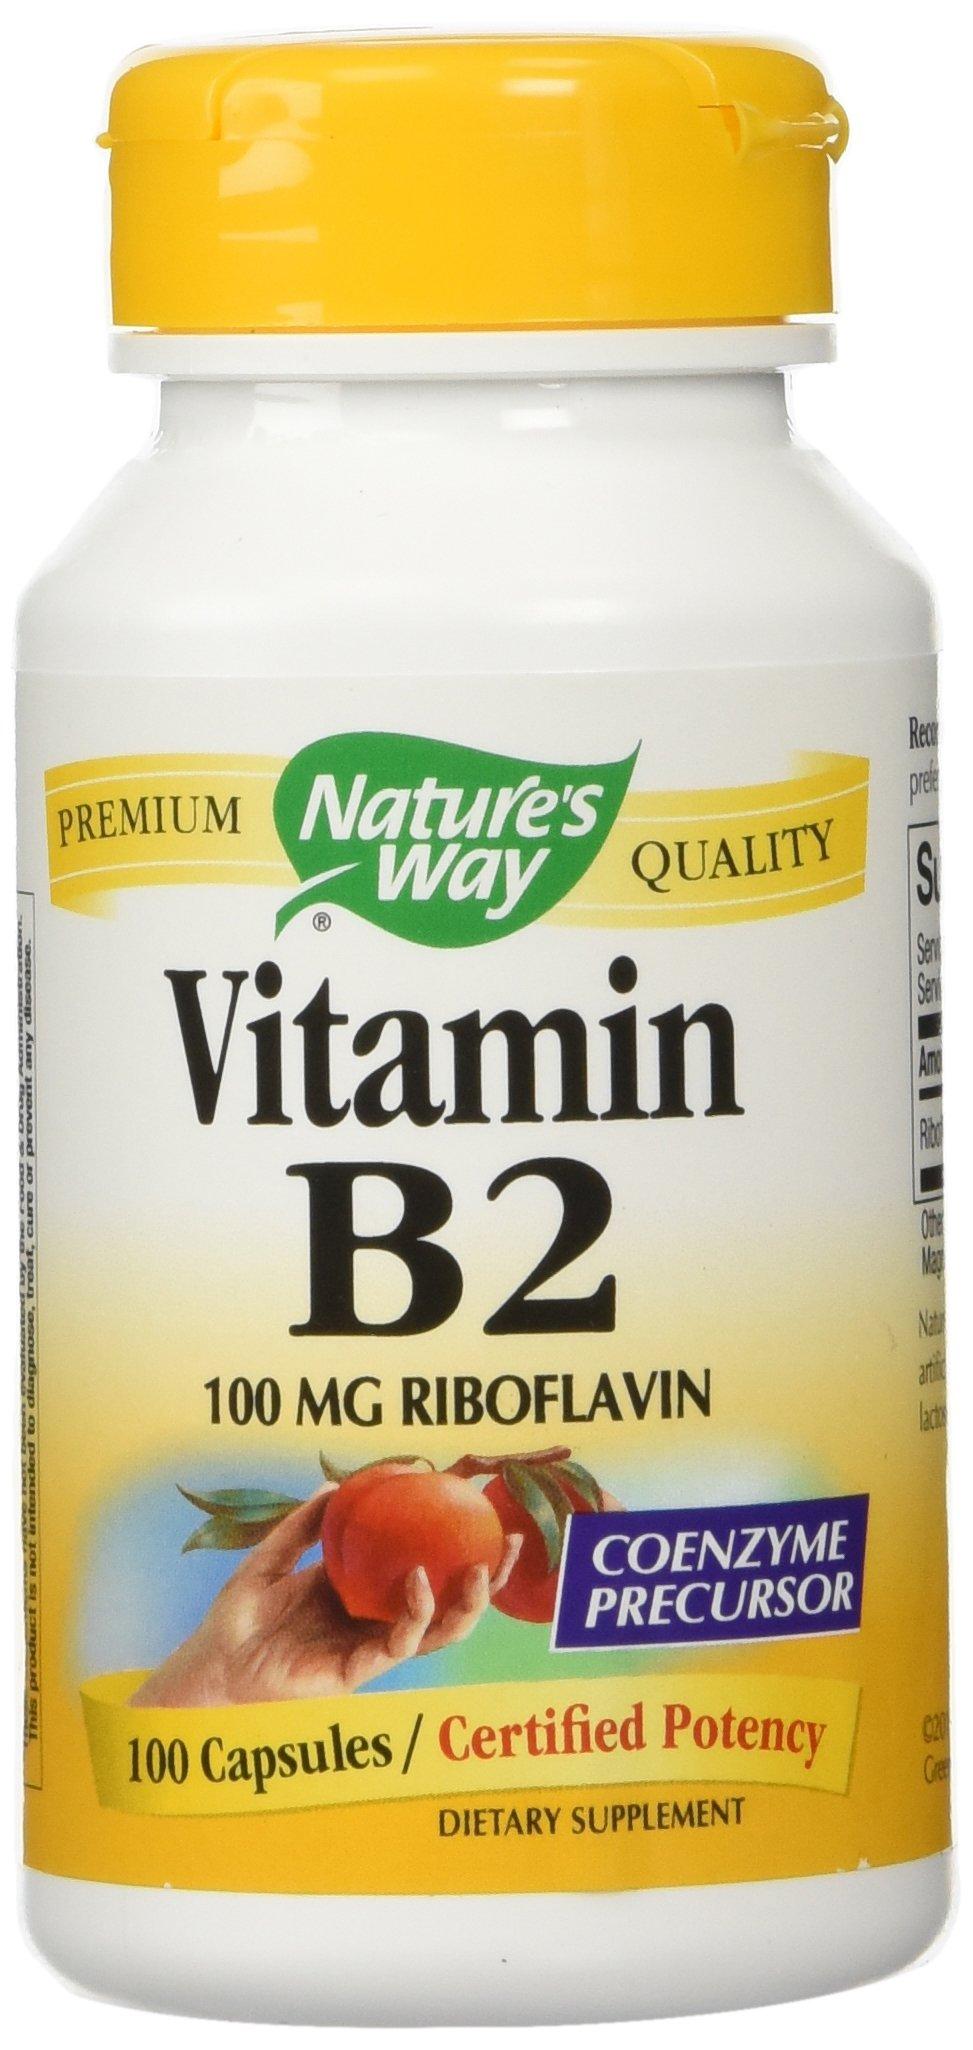 Nature's Way Vitamin B2 100 mg Riboflavin, 100 Capsules (Pack of 2)